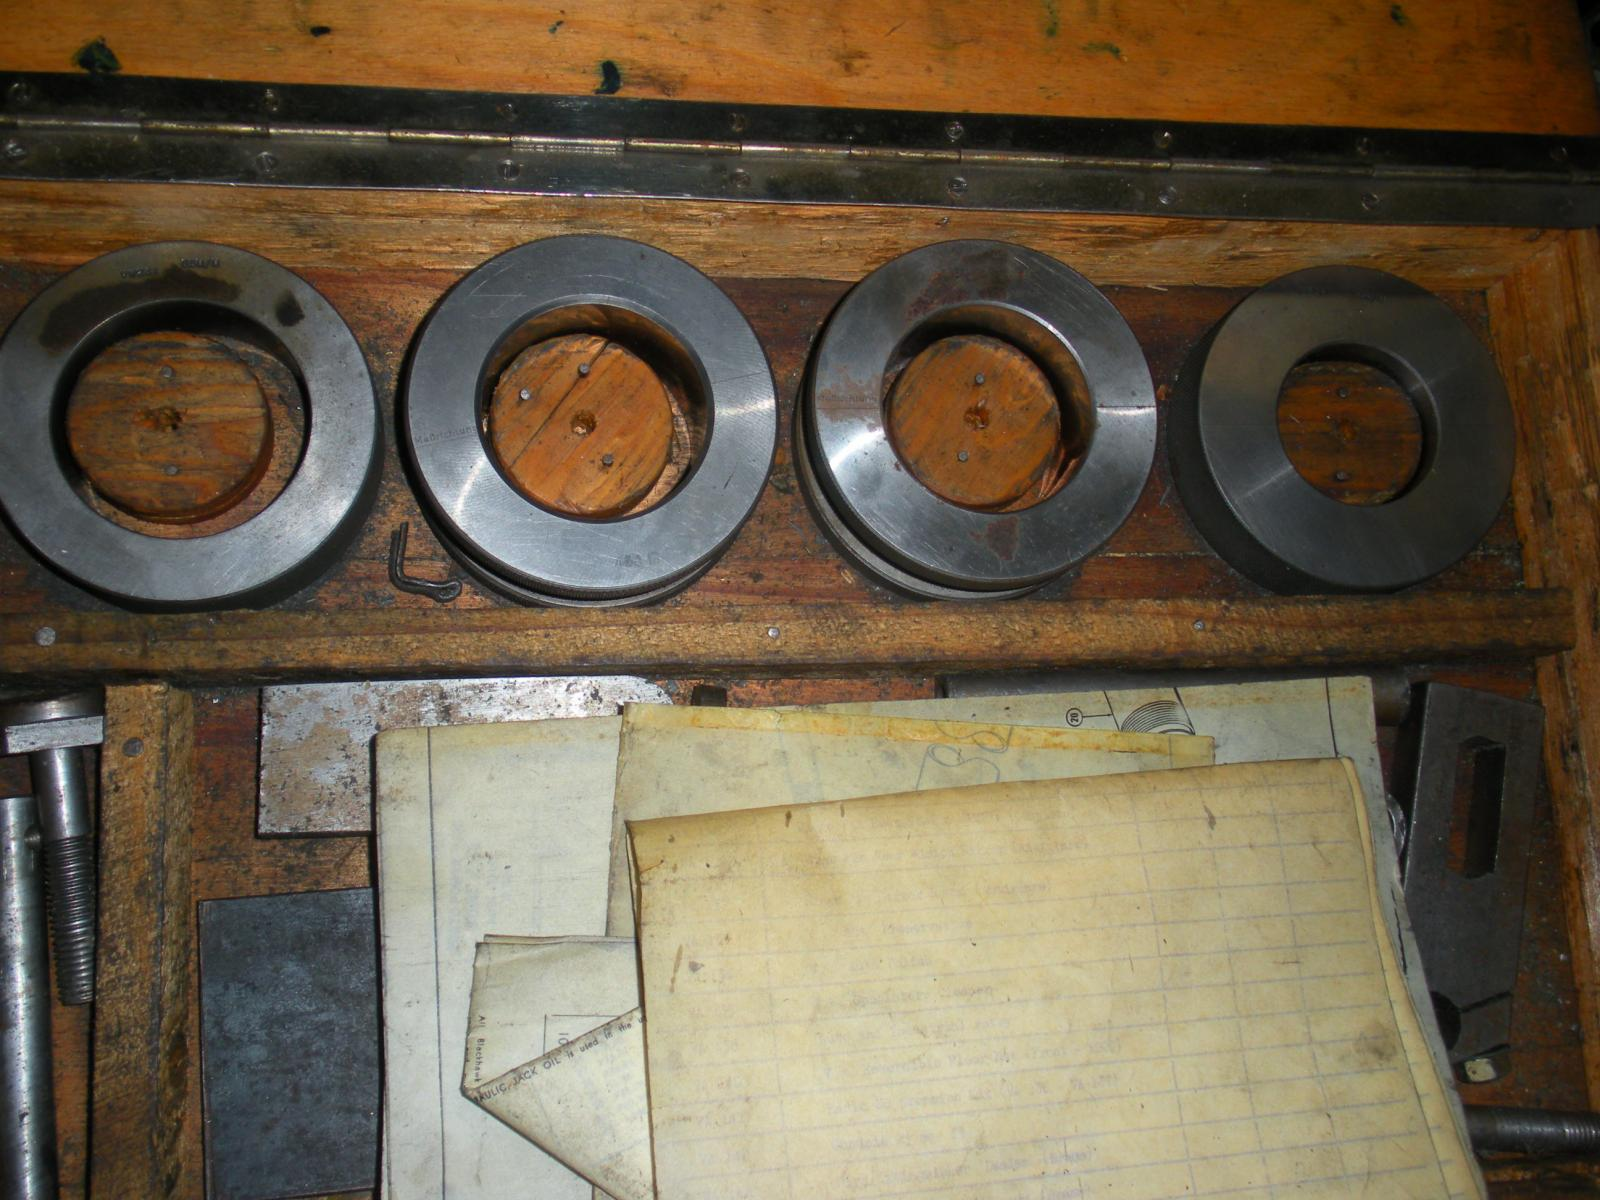 Ludwig-Hunger Crankcase reconditioning set VW247 Master gauges